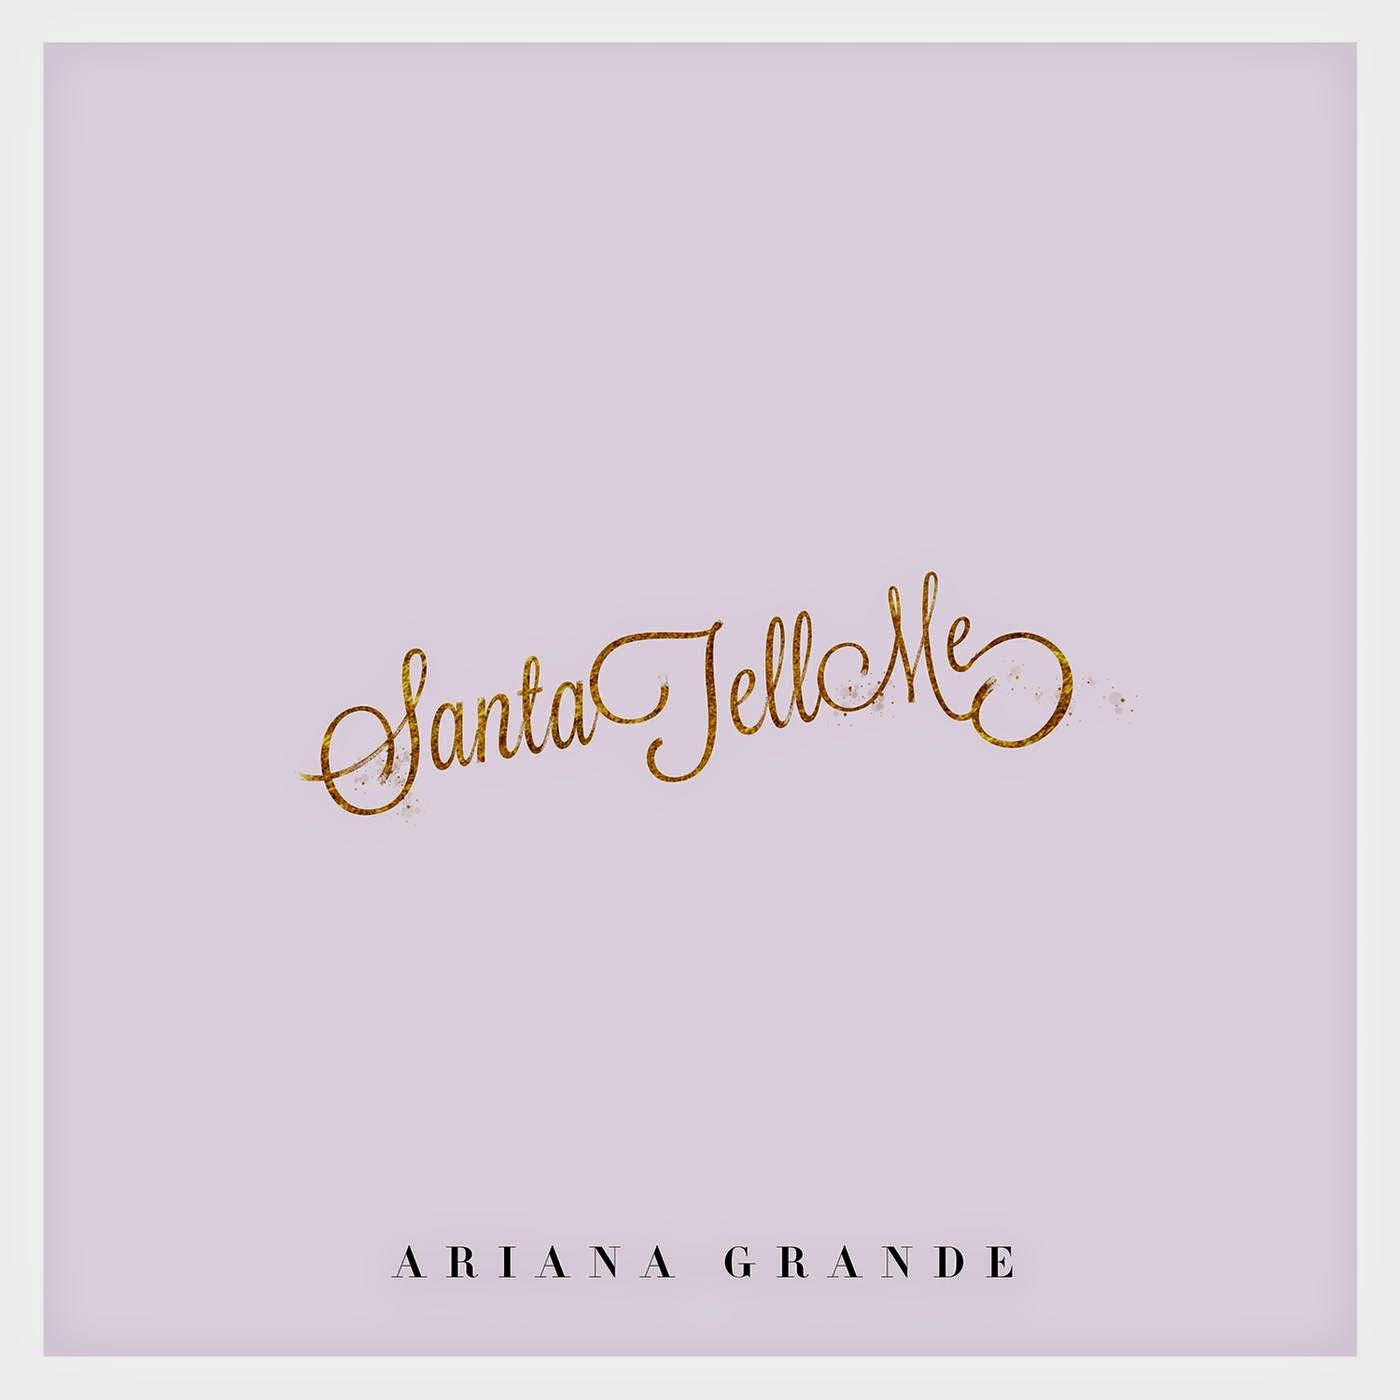 Ariana Grande - Santa Tell Me - Single